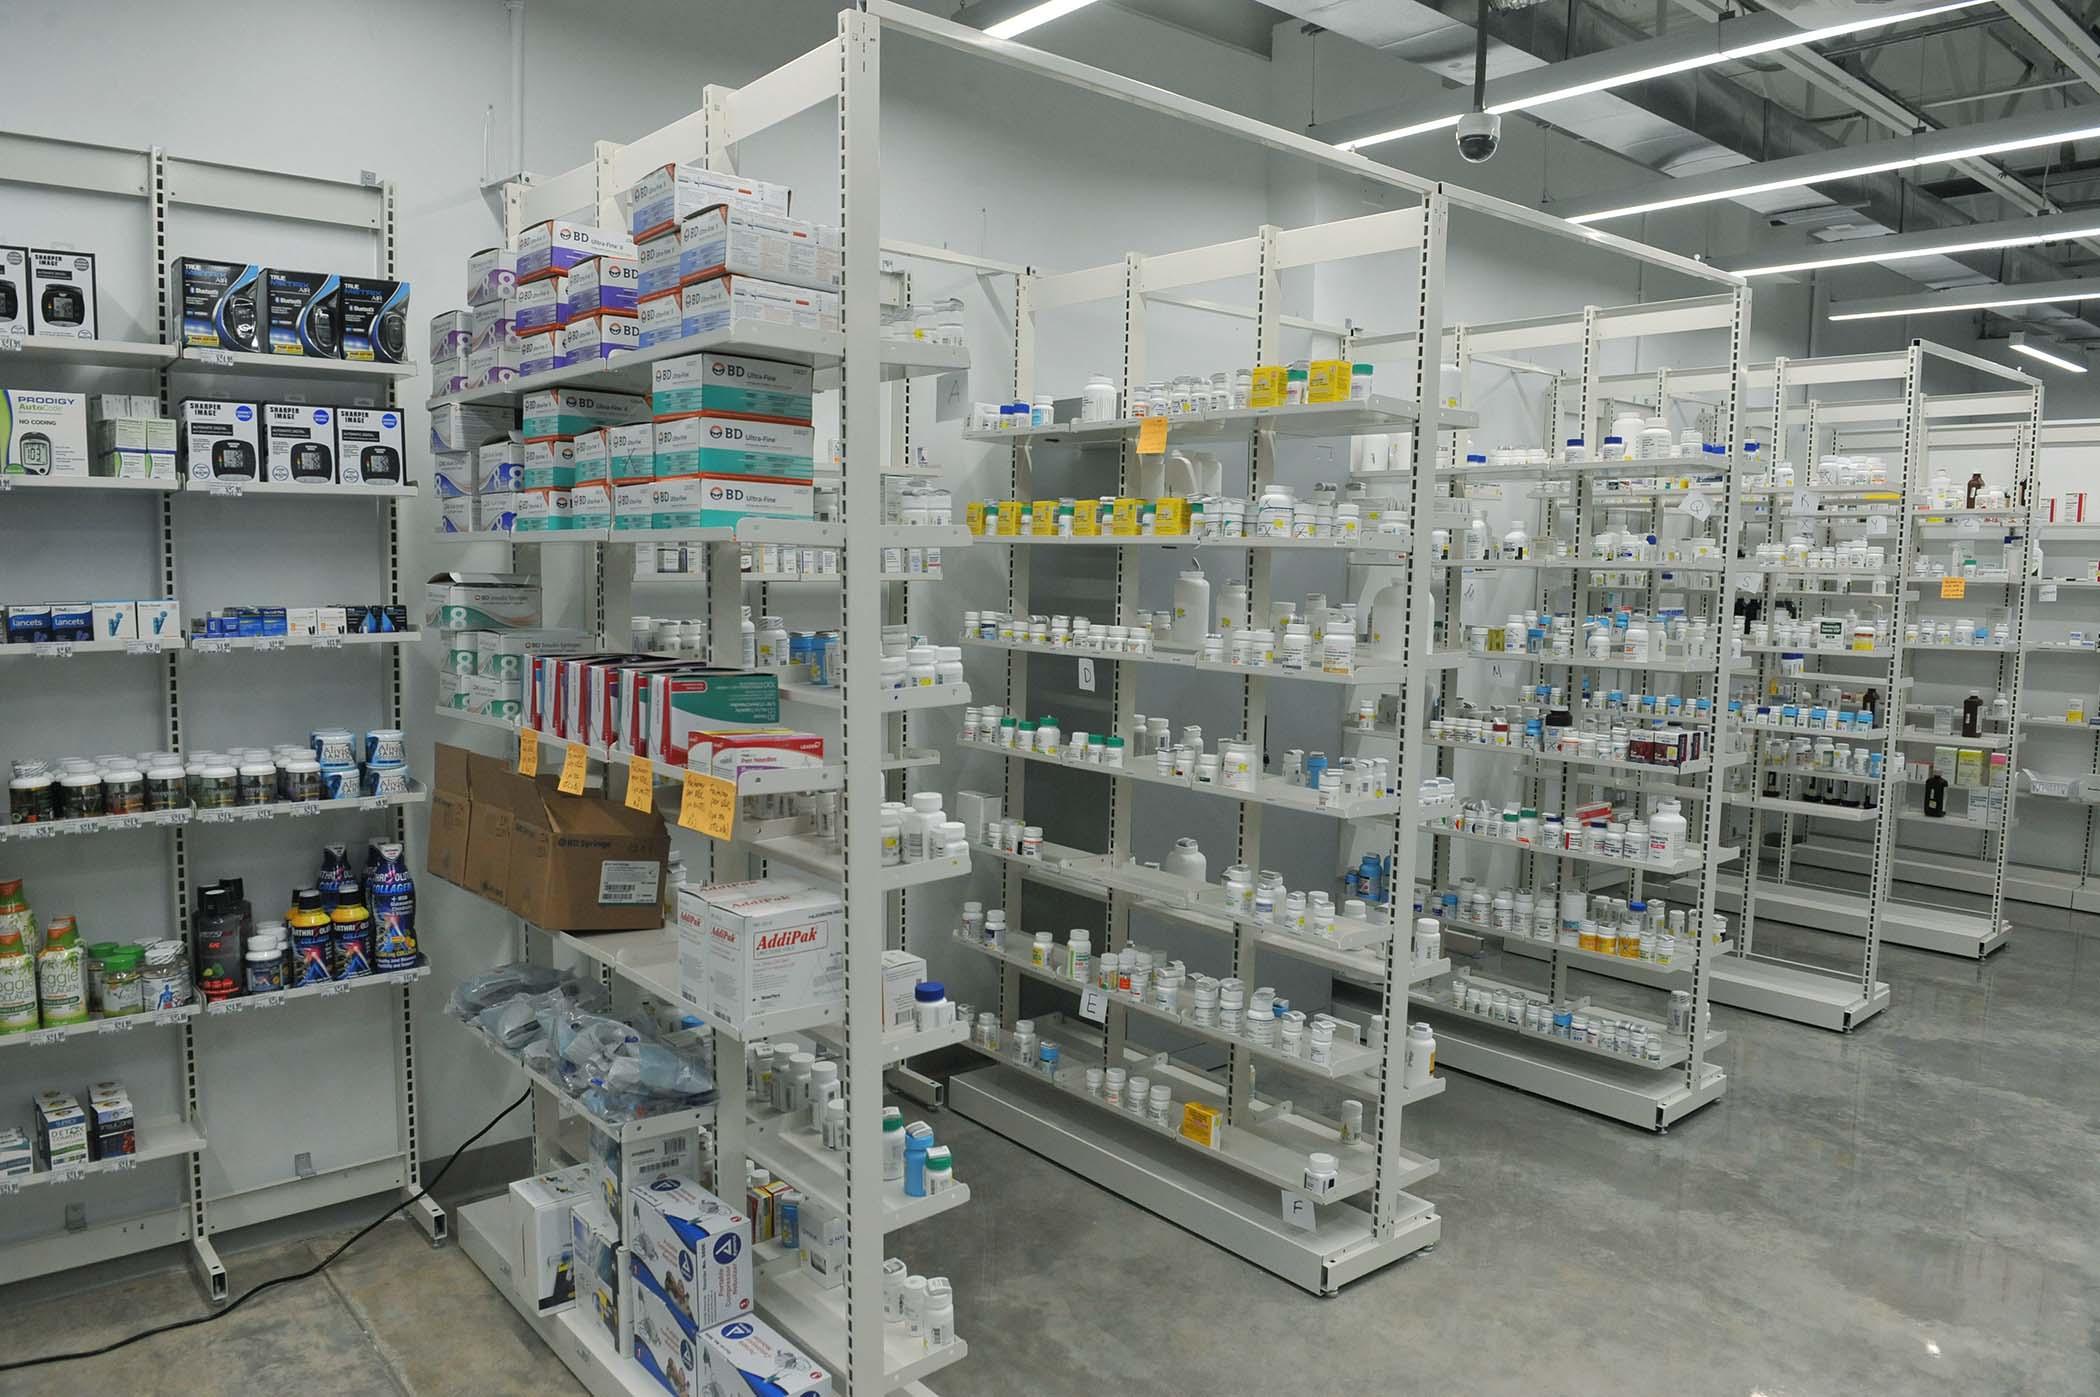 Inauguracion_Farmacias_Plaza-Plaza_del_Sol-20.jpg